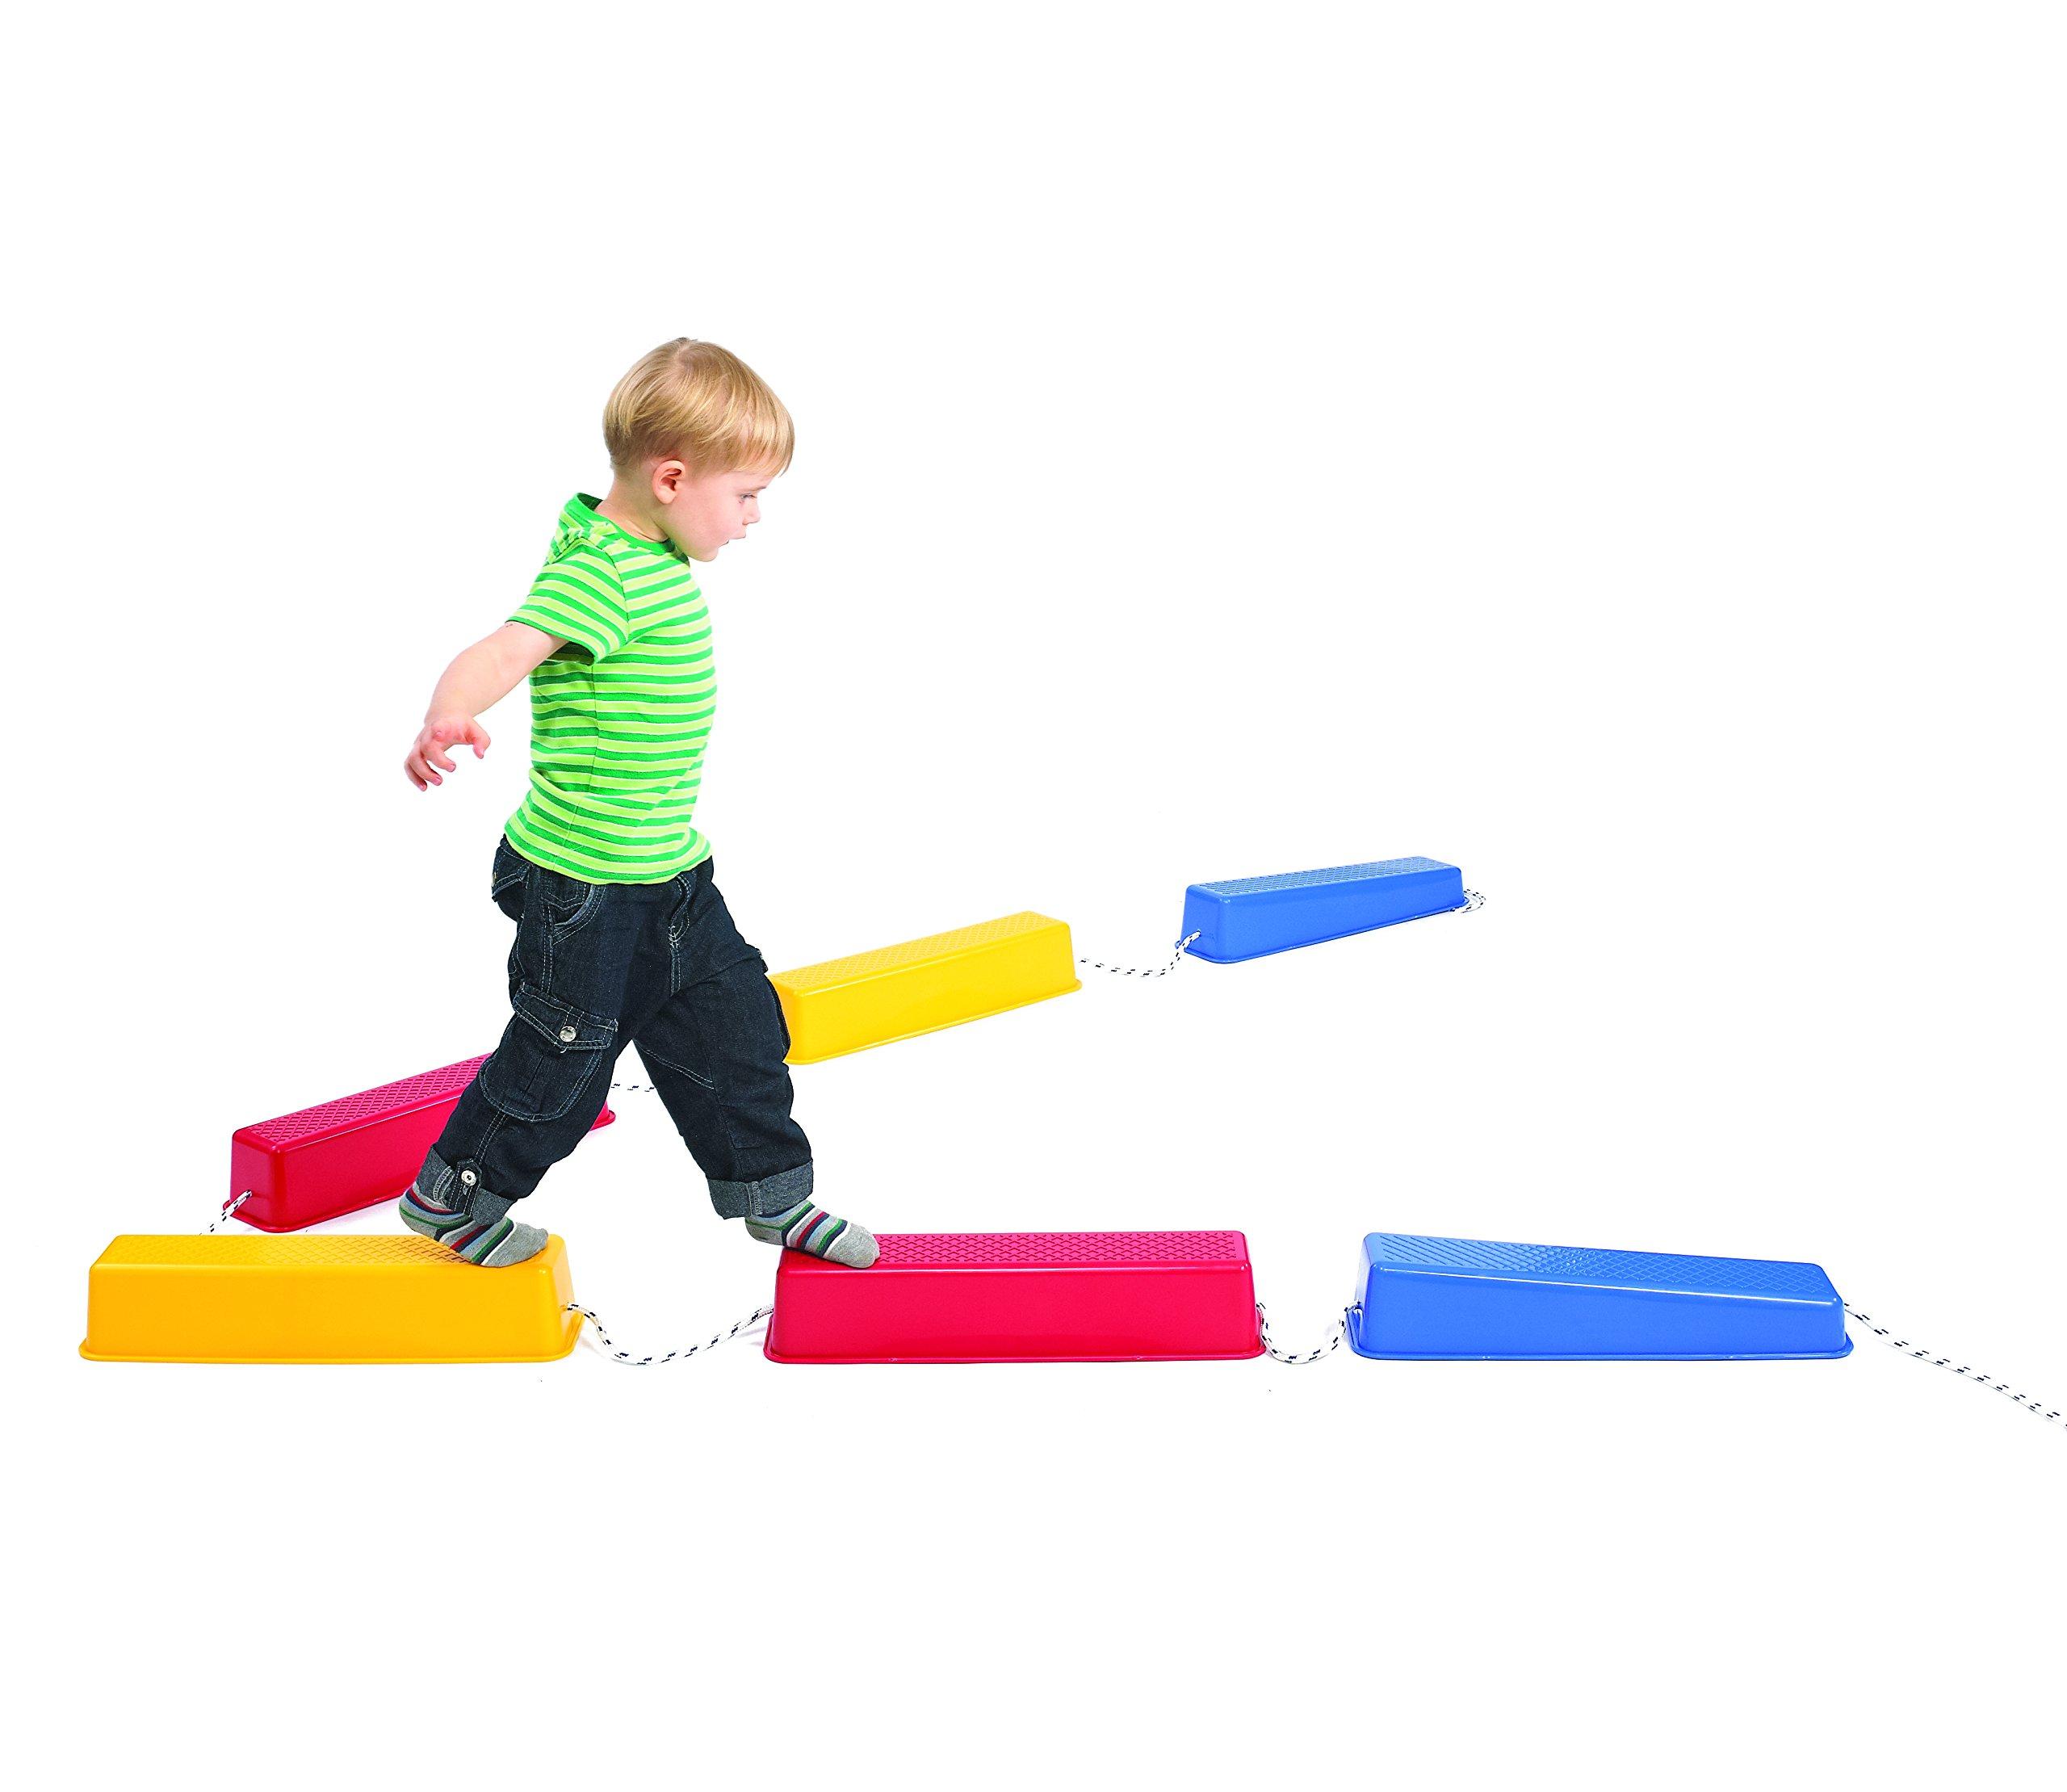 edx education Step-a-Logs - Balance Beams for Kids